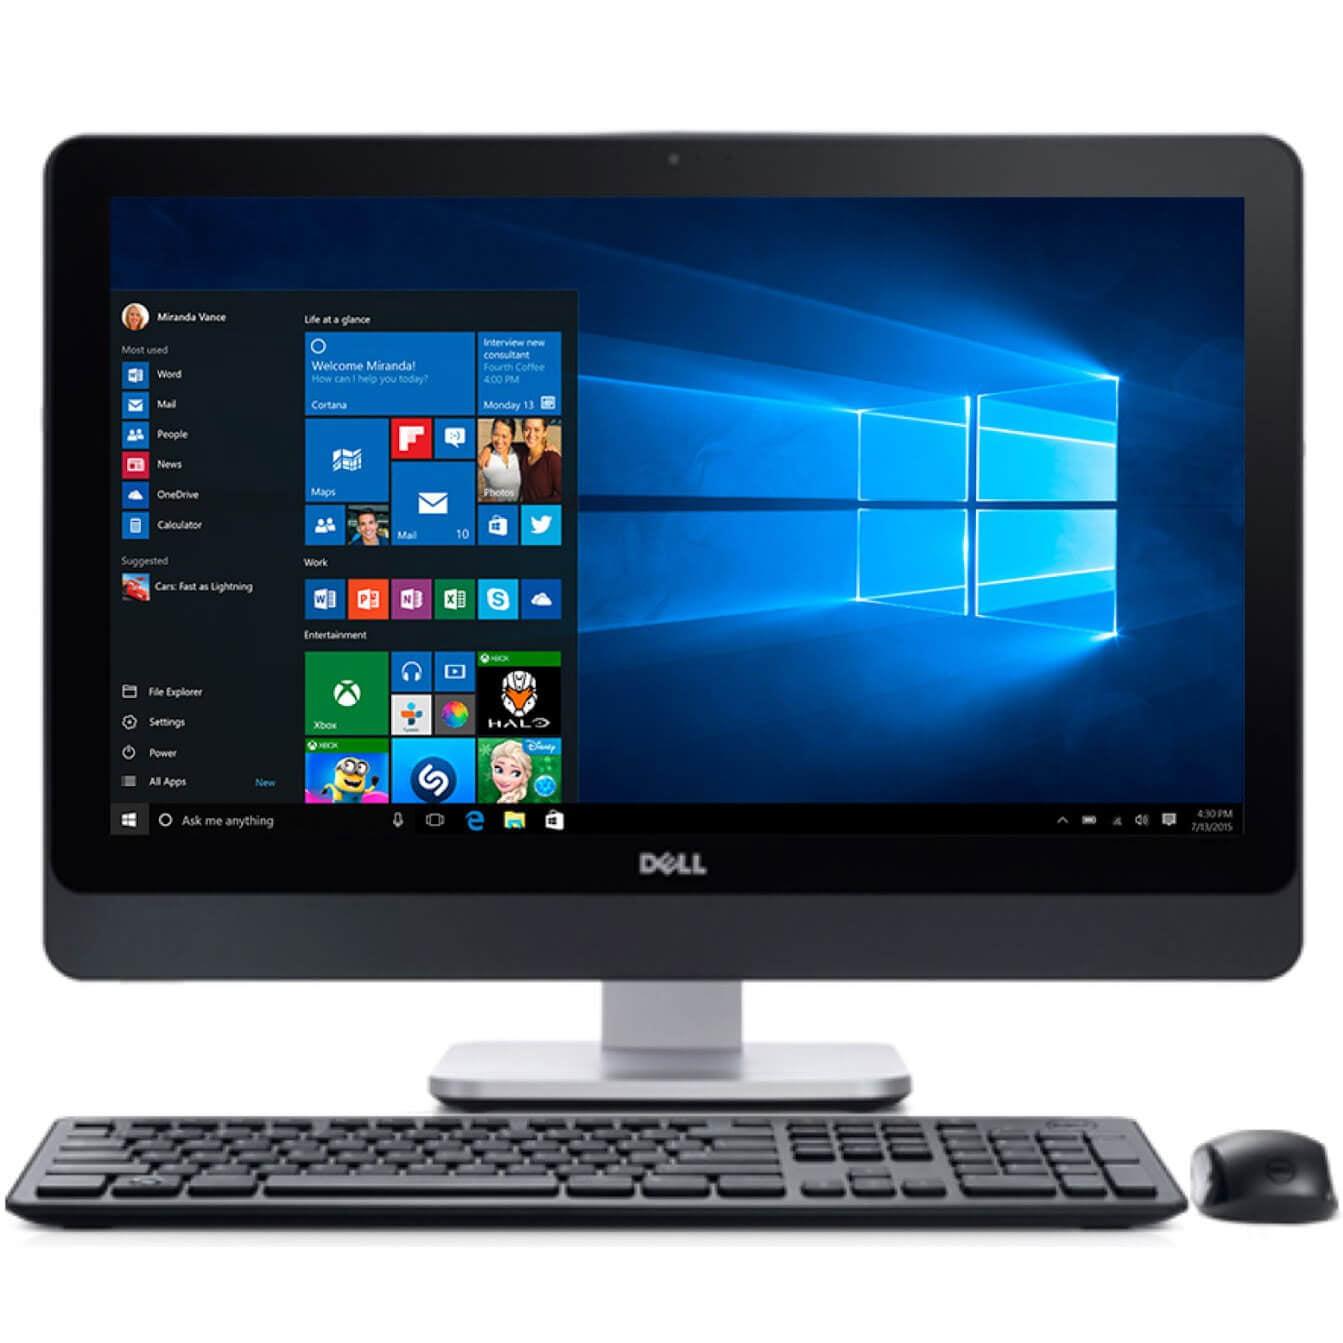 "Refurbished Dell Optiplex 9020 23"" All In One Desktop Computer Intel i5-4570S 8GB 500GB W10P by Dell"